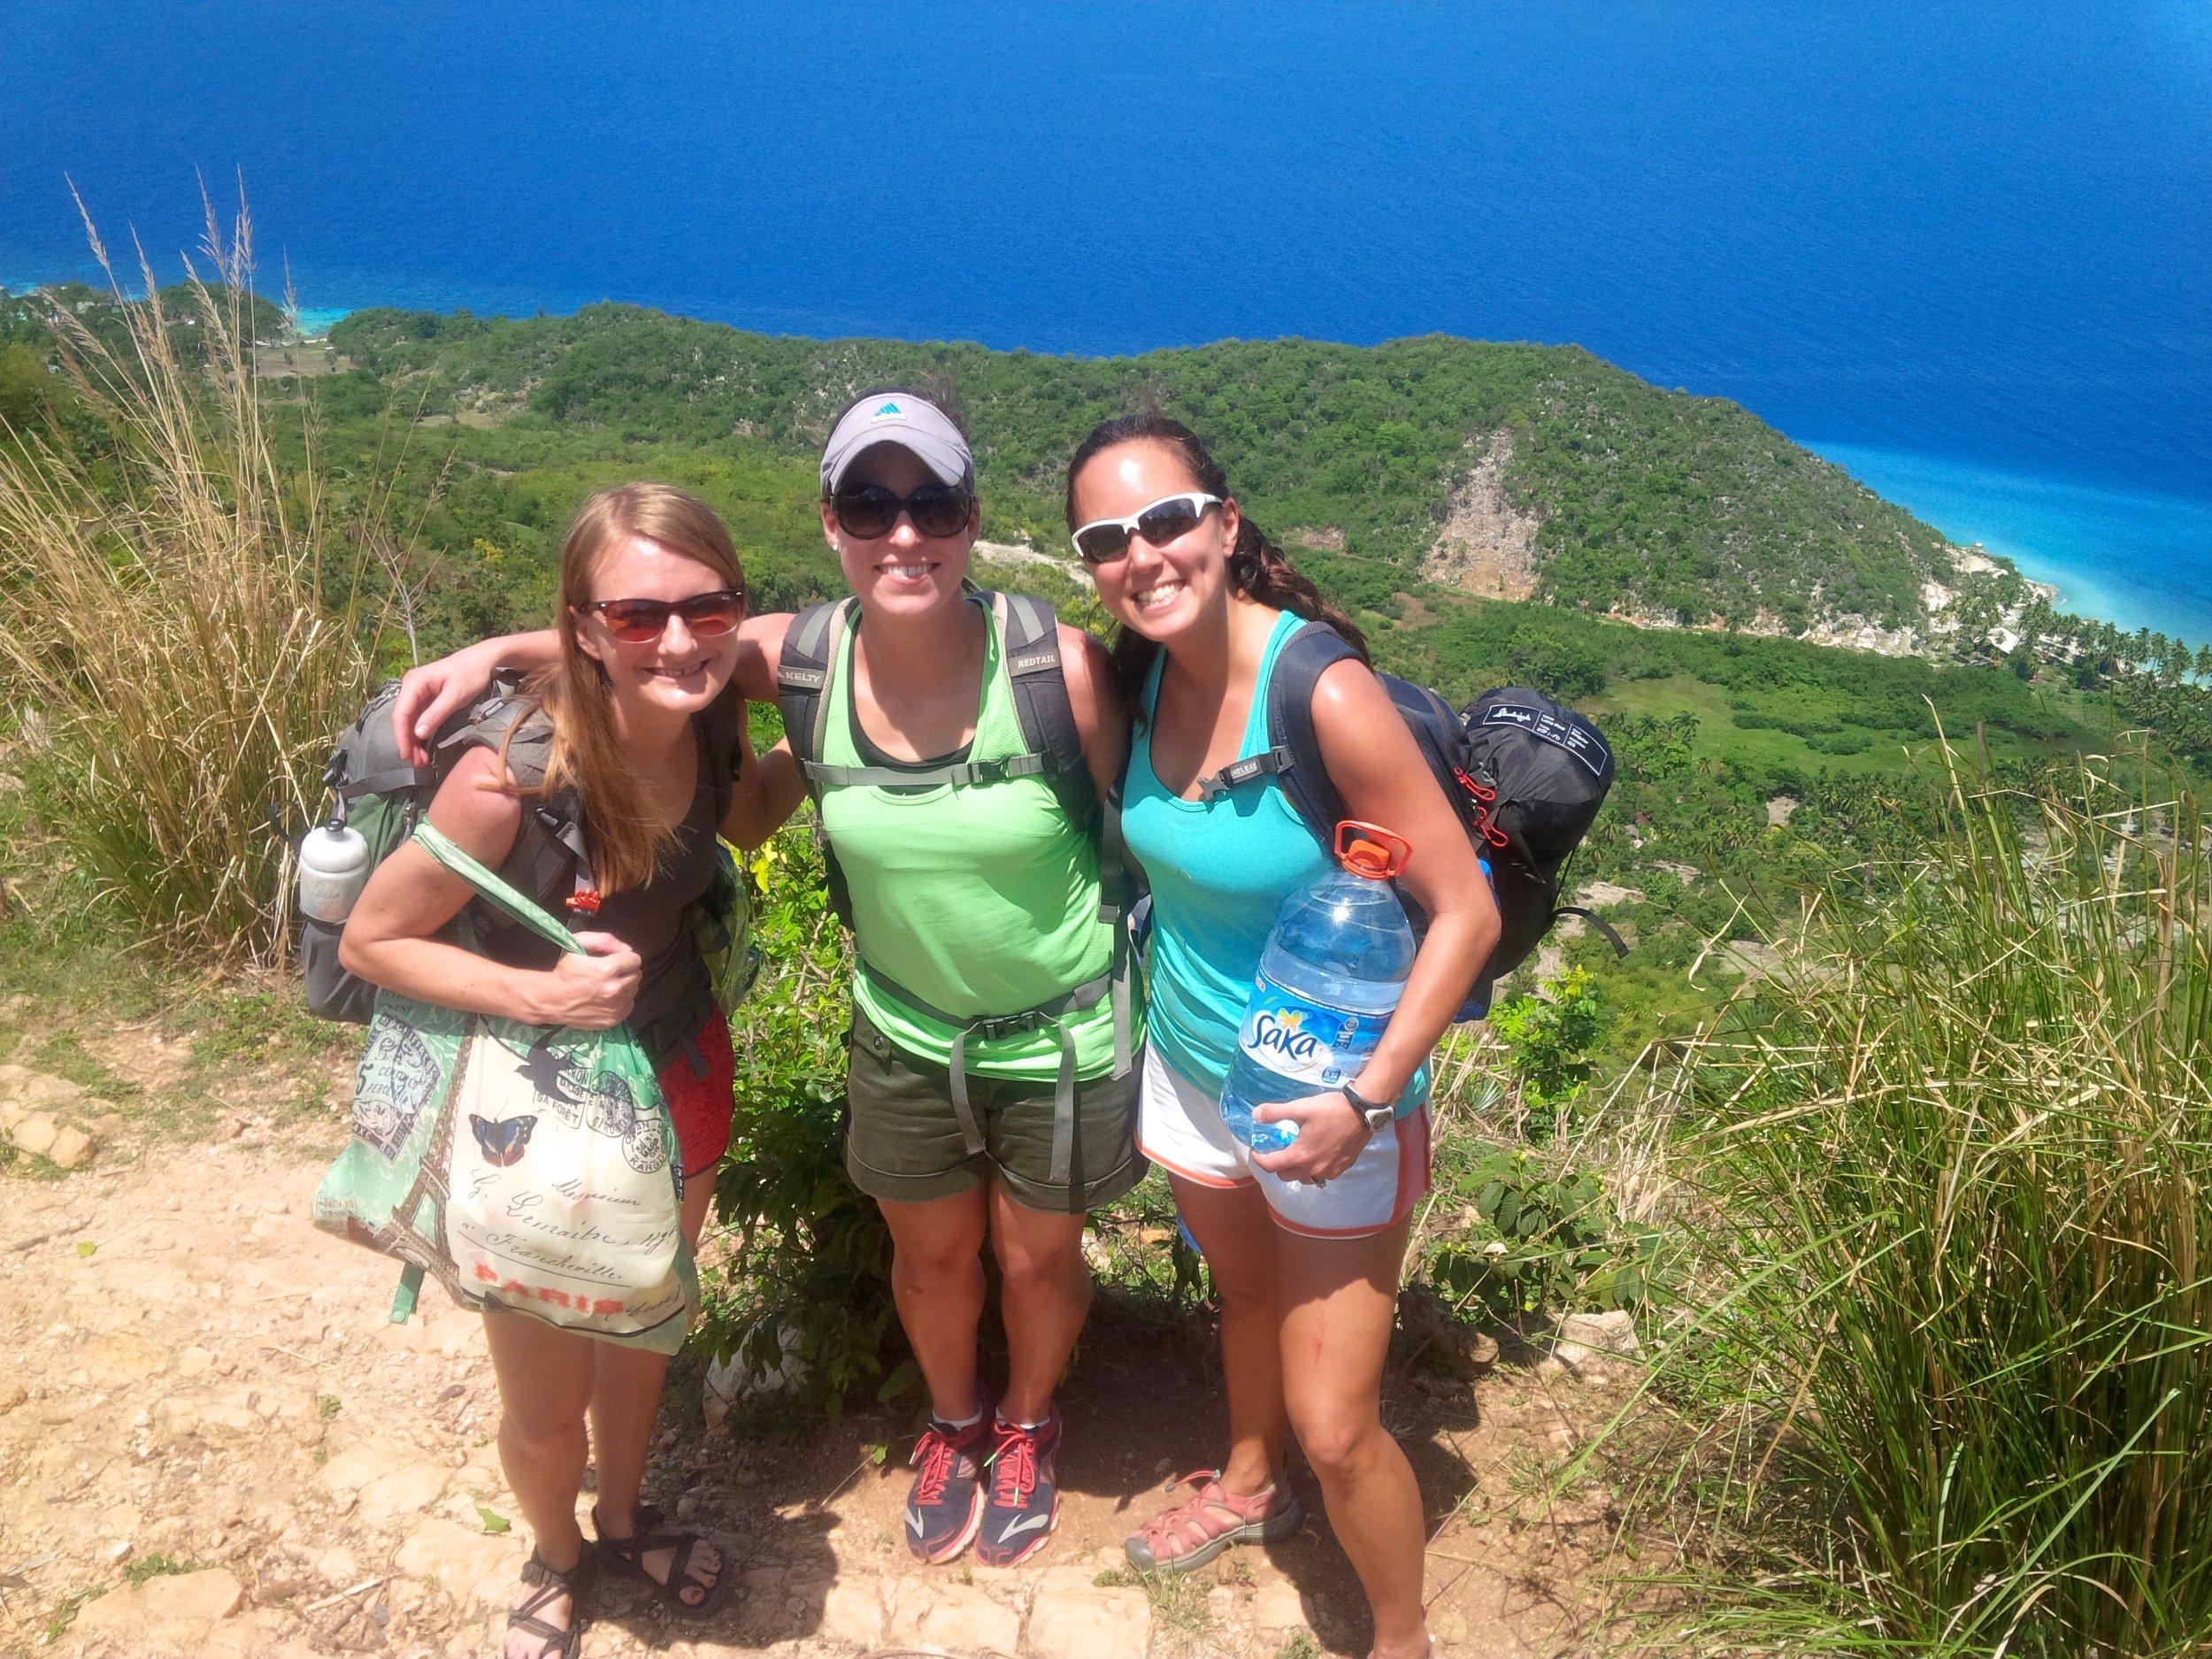 Hiking to a remote beach in Haiti. Photo credit: Patrick Hardin.